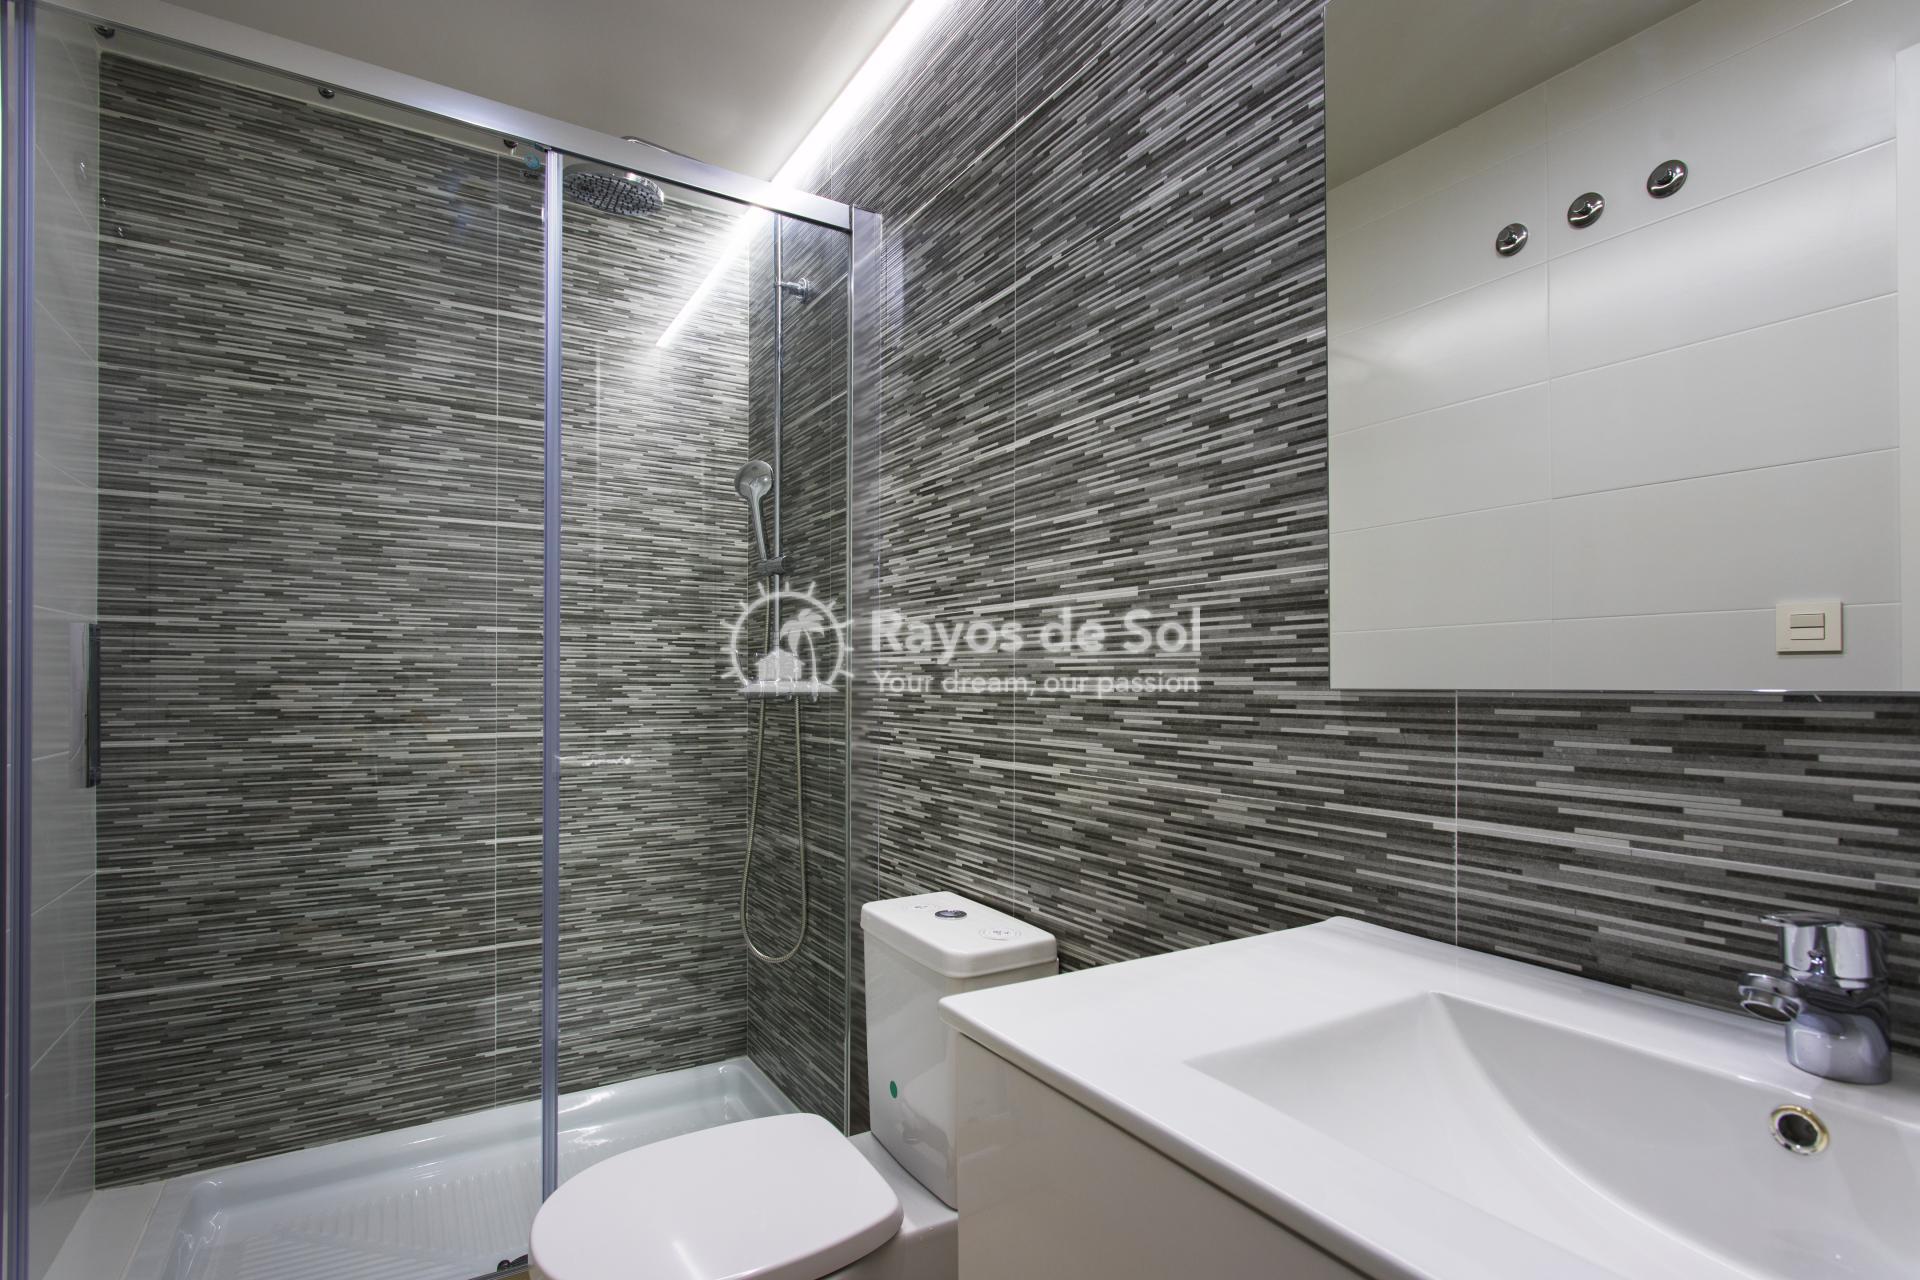 Appartement begane grond  in La Florida, Orihuela Costa, Costa Blanca (Oasis place BG3-2) - 15